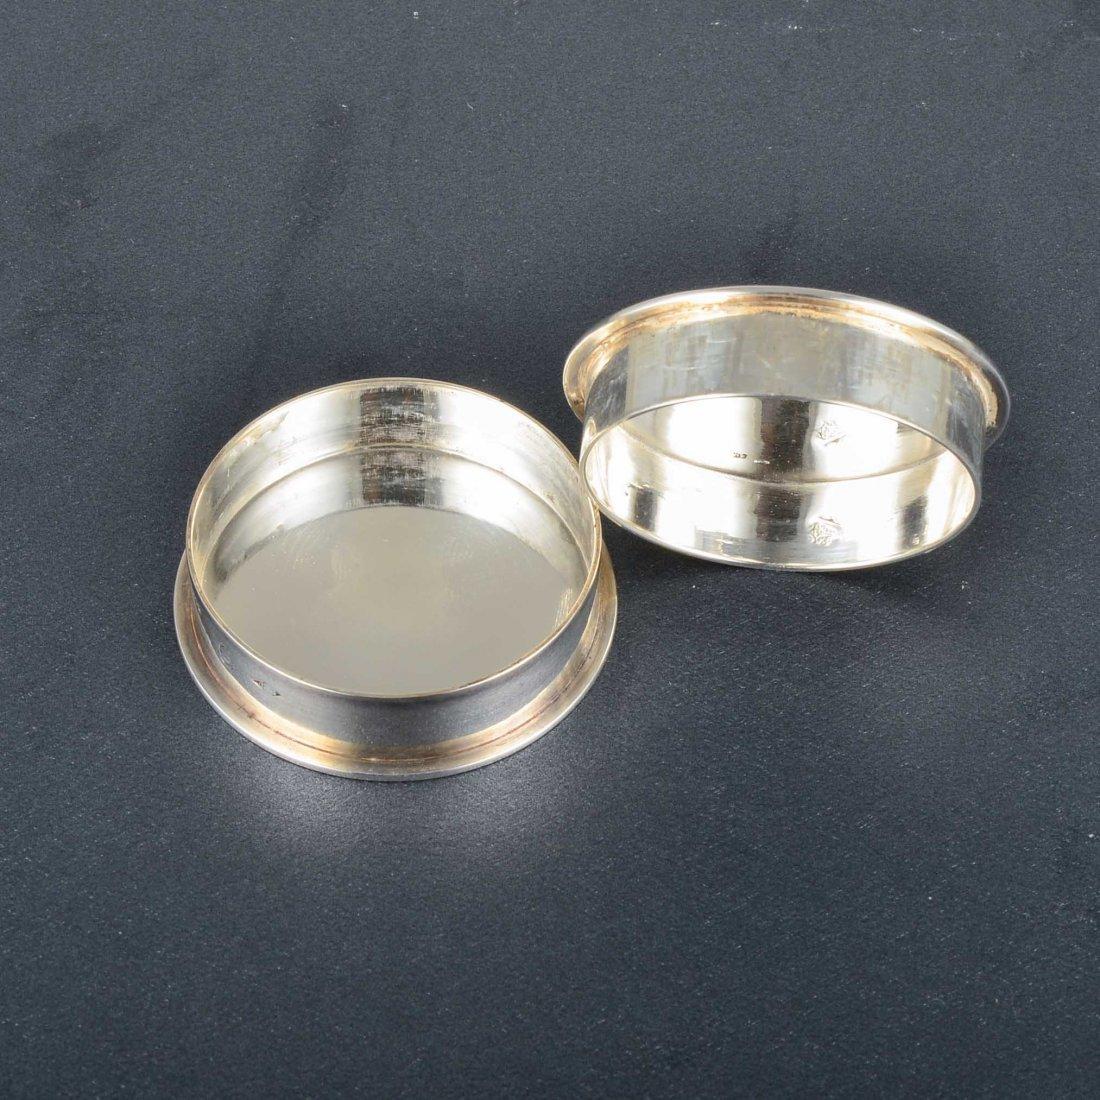 Hermes Silver Pillbox - 4